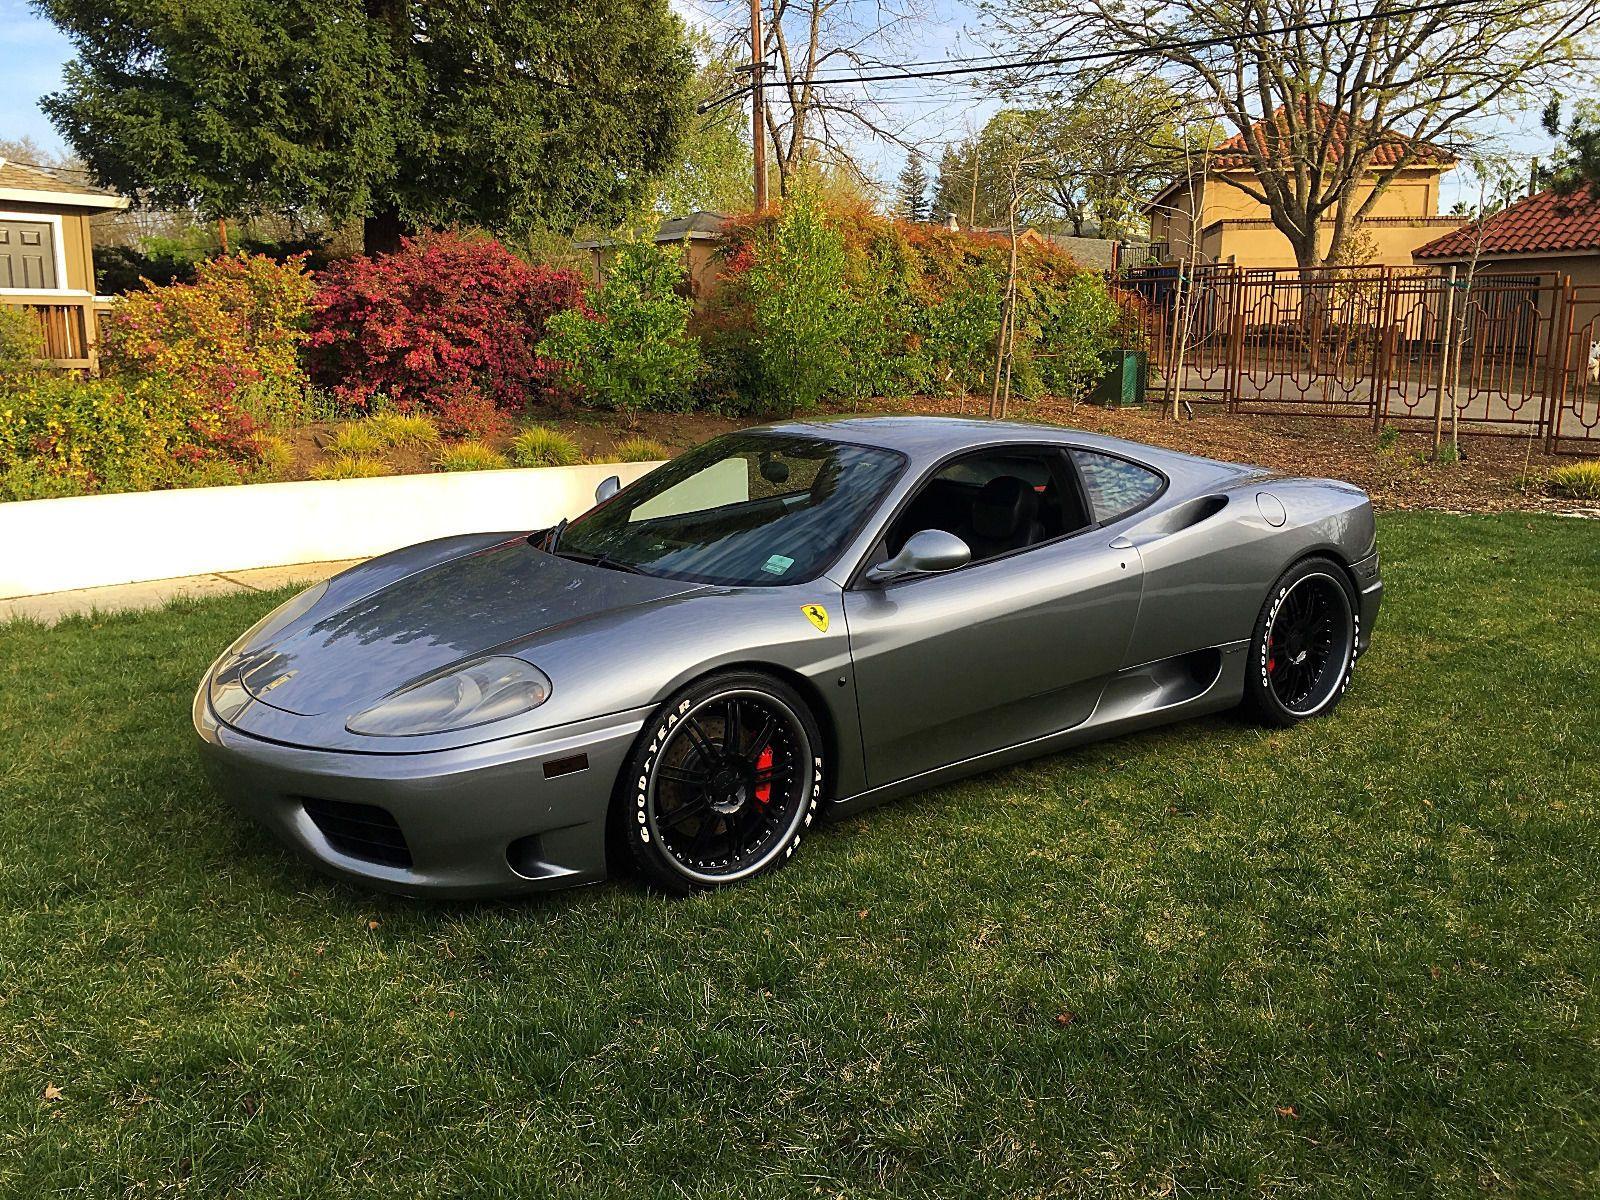 Salvage Title Cars For Sale >> 2000 Ferrari 360 Modena F1 for sale